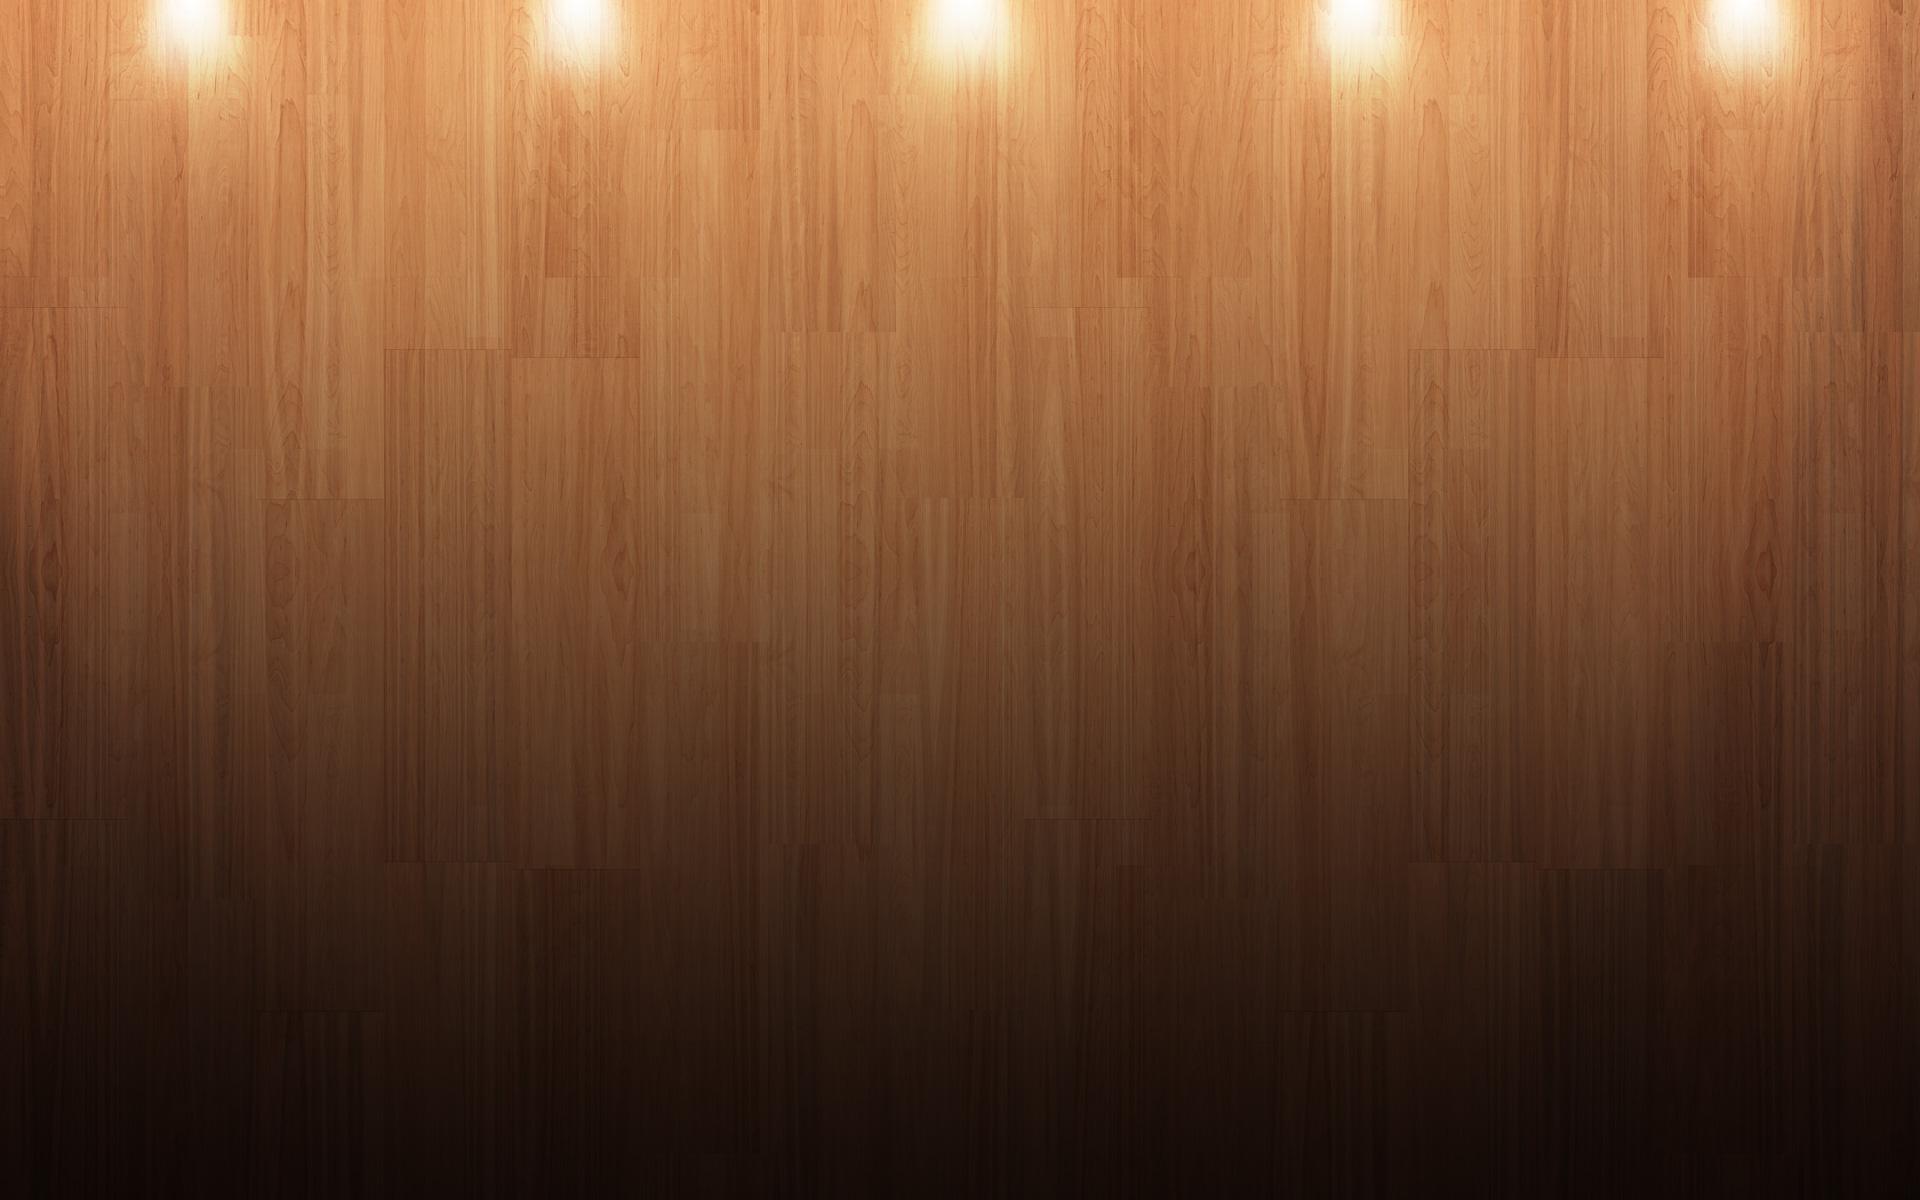 Wood Paneling 04 WS By Temporalvistasquash Desktop Wallpaper   Home 1920x1200